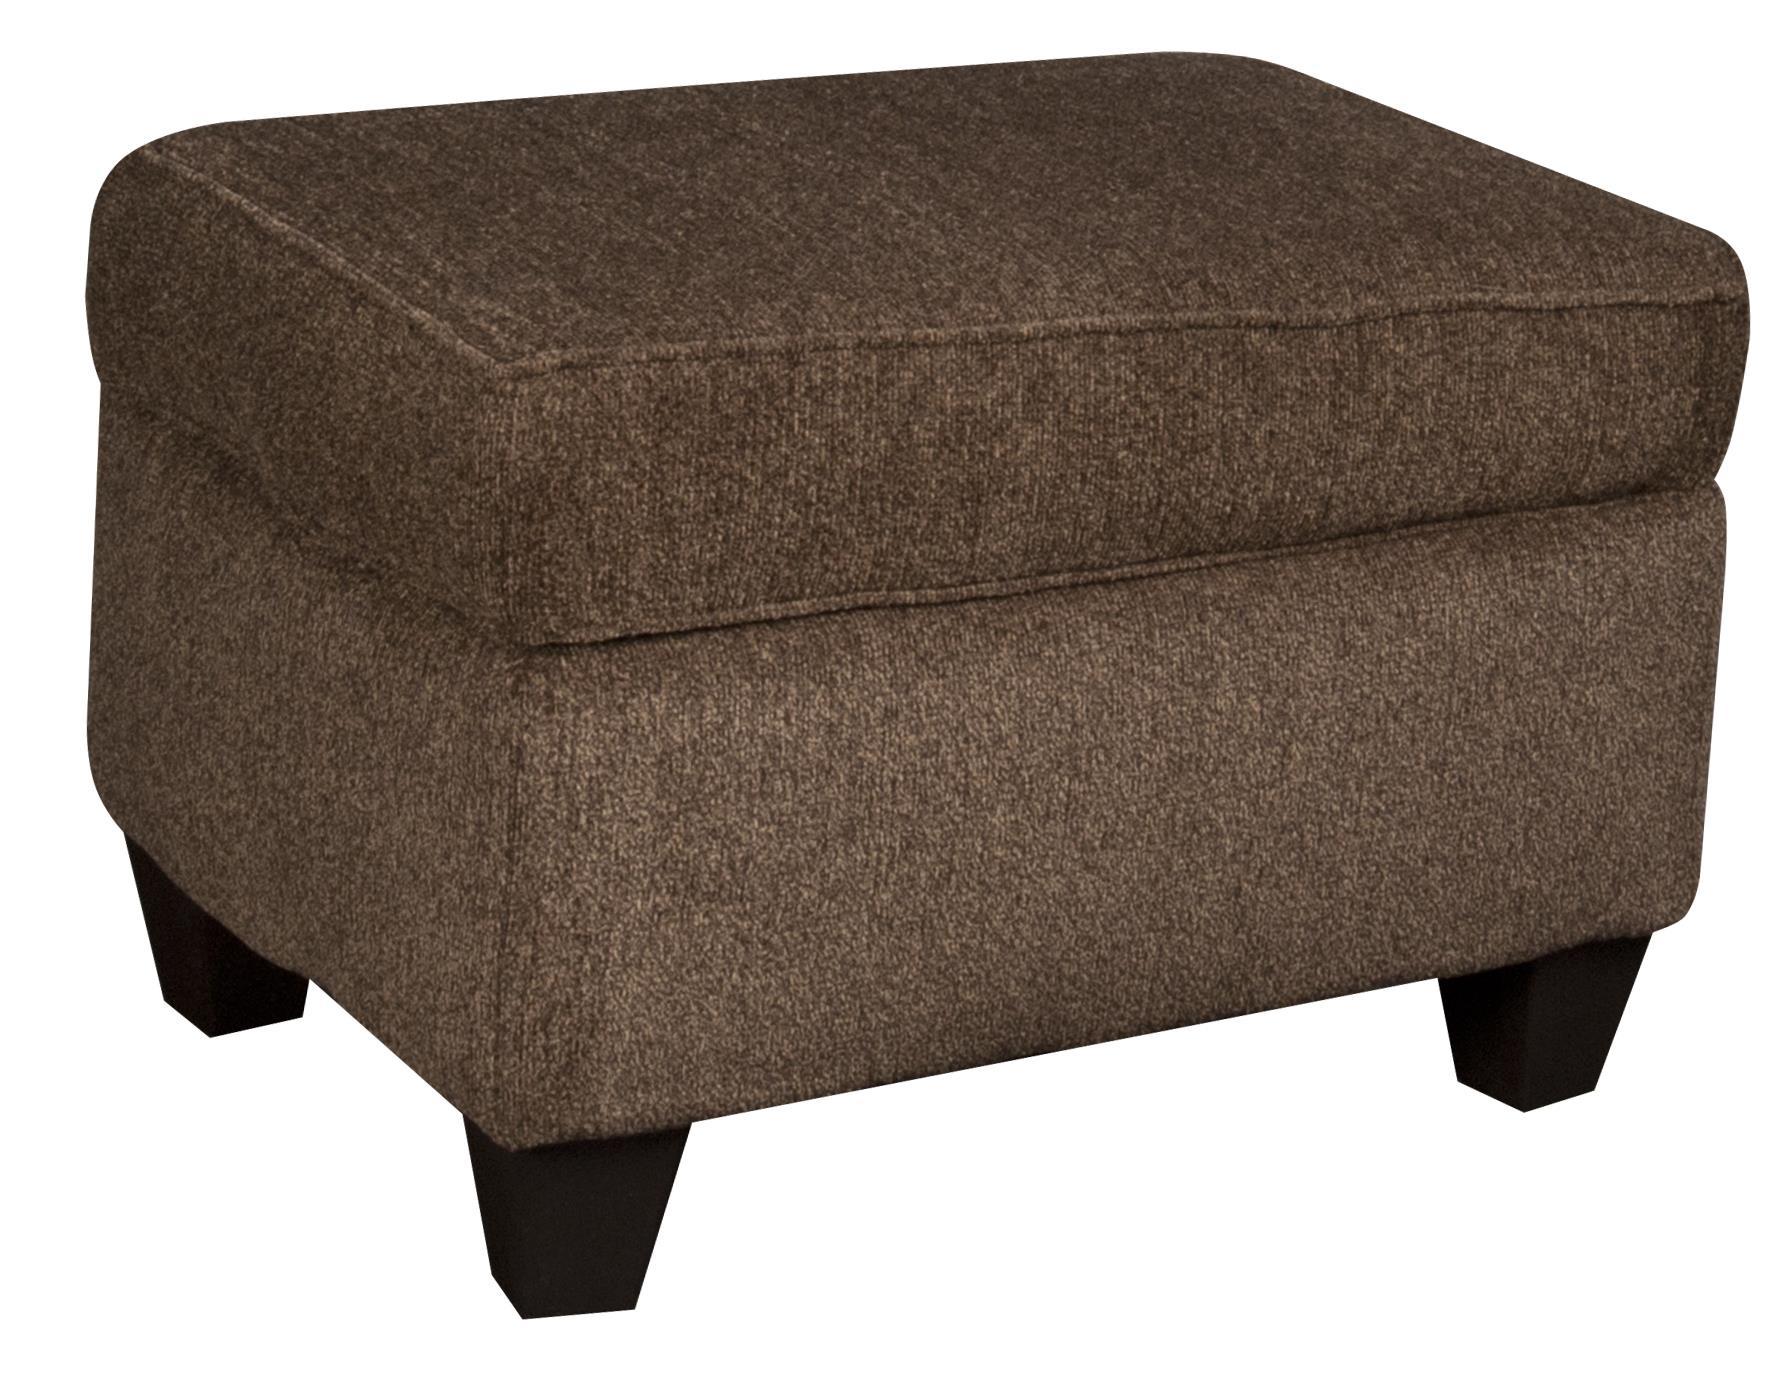 Morris Home Furnishings Wilson - Wilson Ottoman - Item Number: 623432901